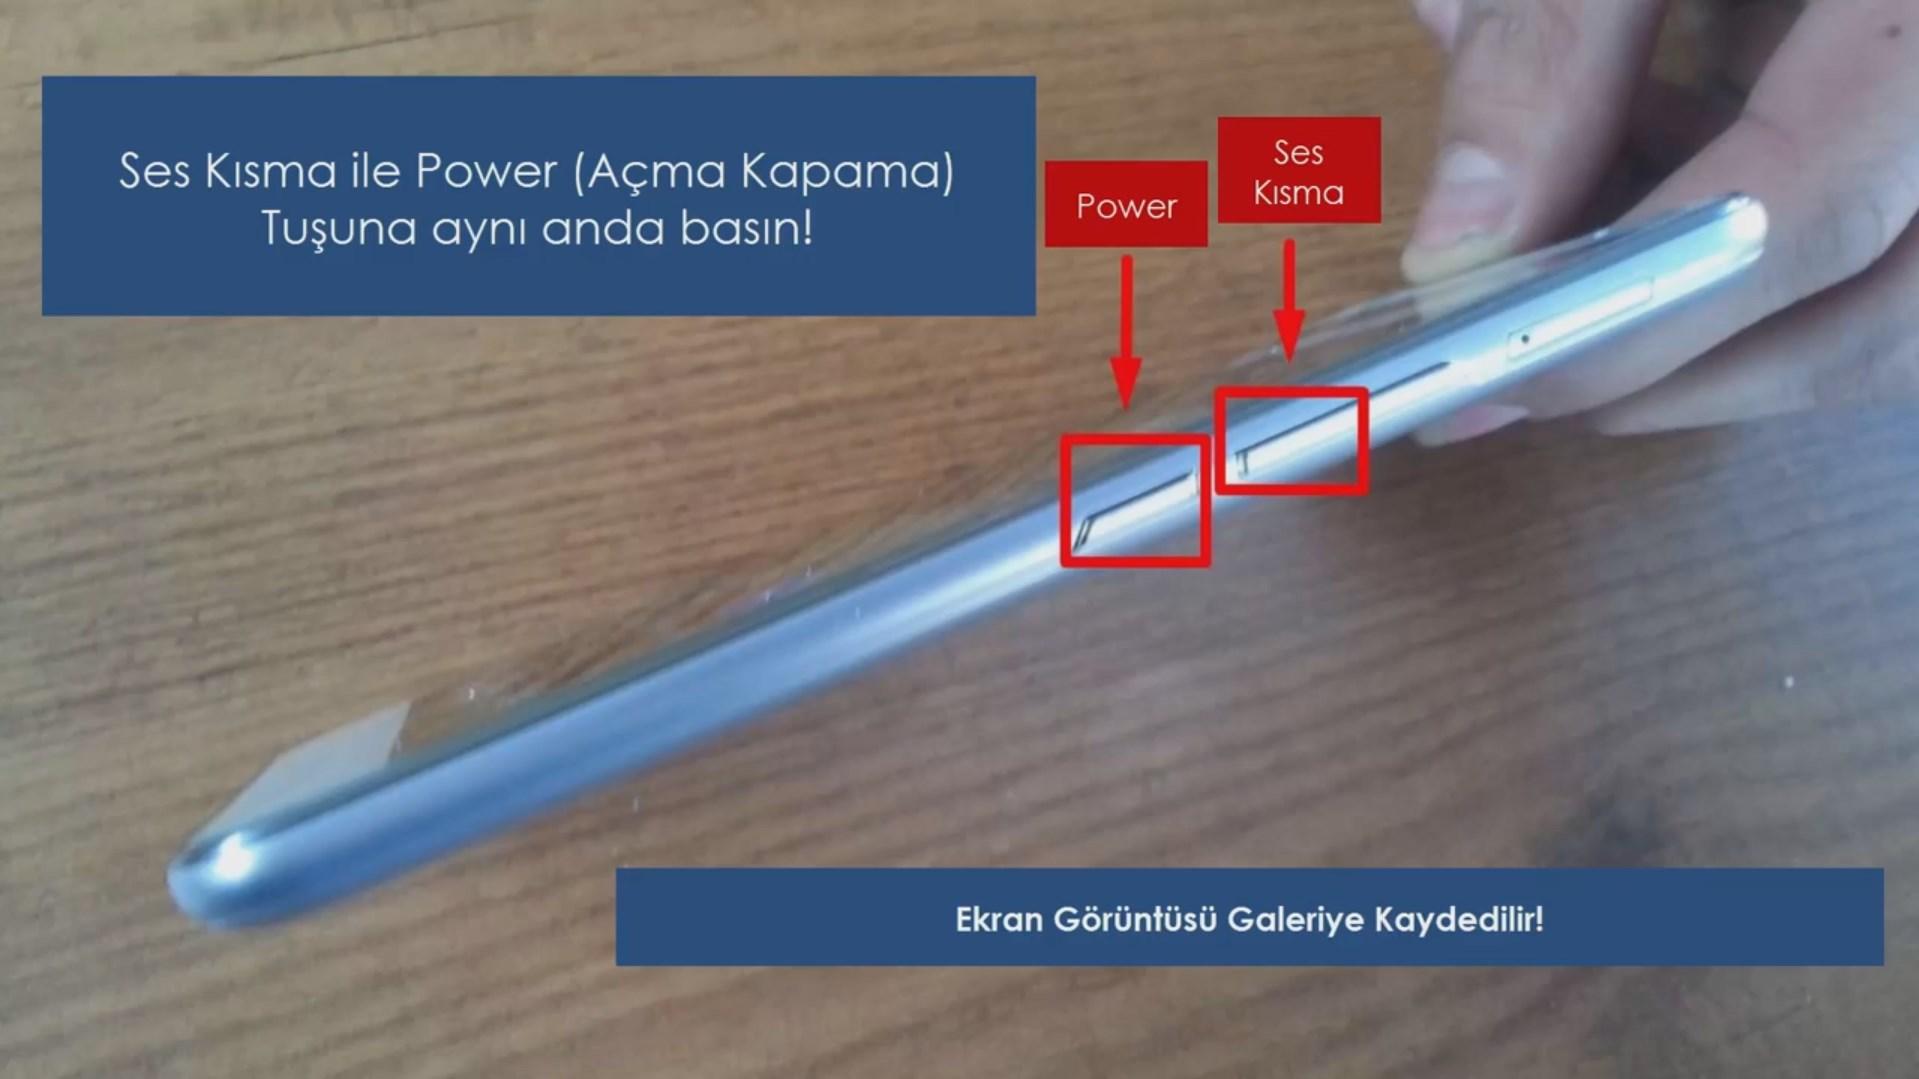 vodafone-smart-ultra-6-ekran-goruntusu-4g